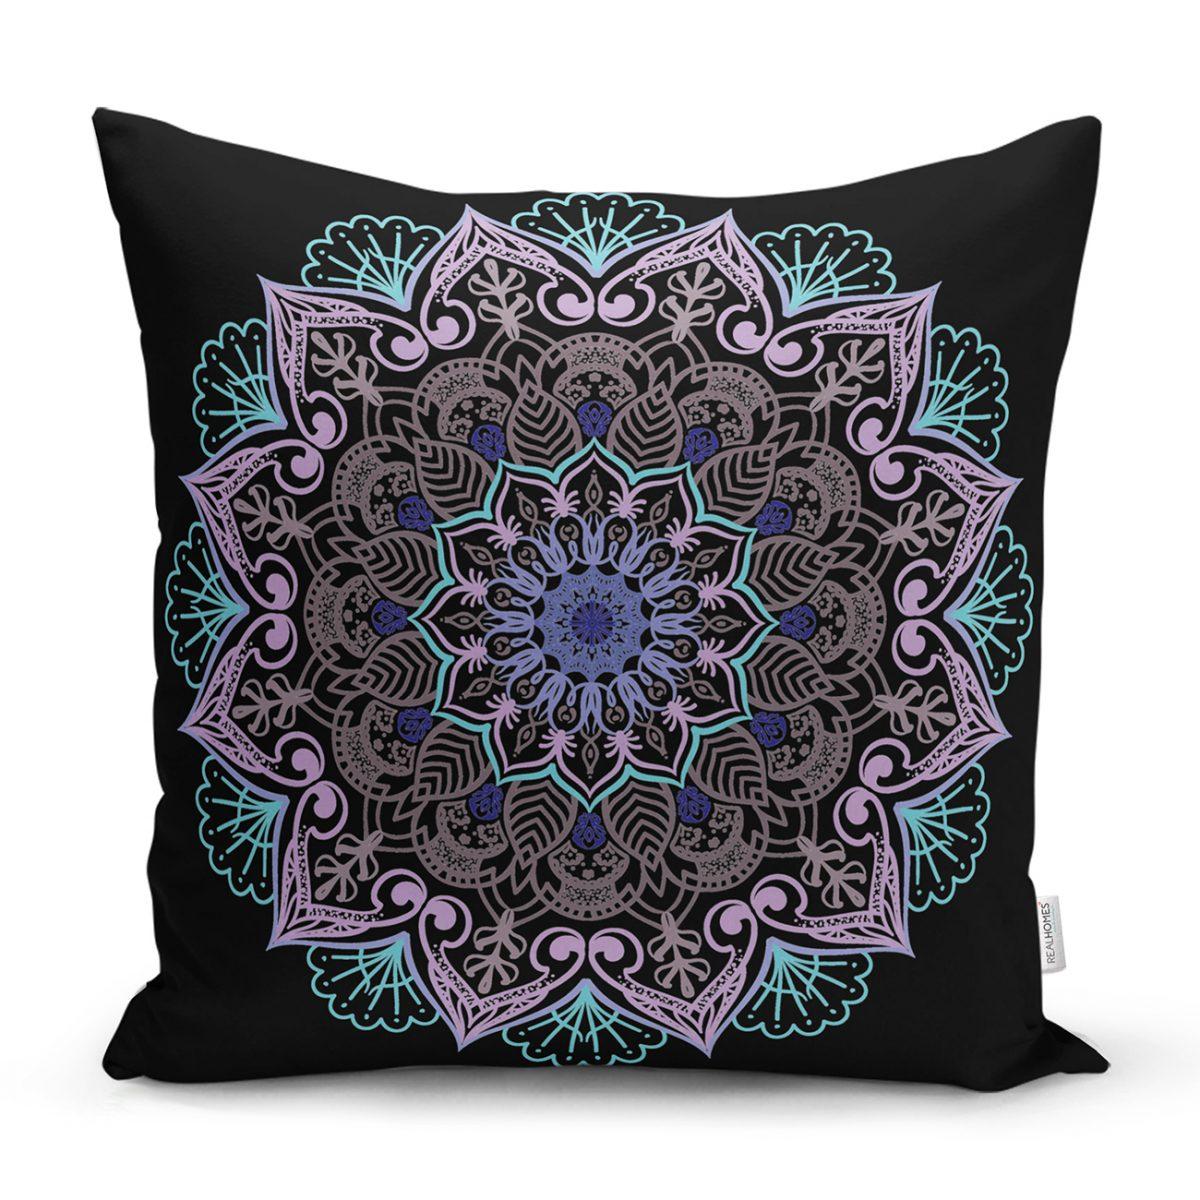 Siyah Zeminde Pembe Mavi Mandala Desenli Modern Yastık Kılıfı Realhomes